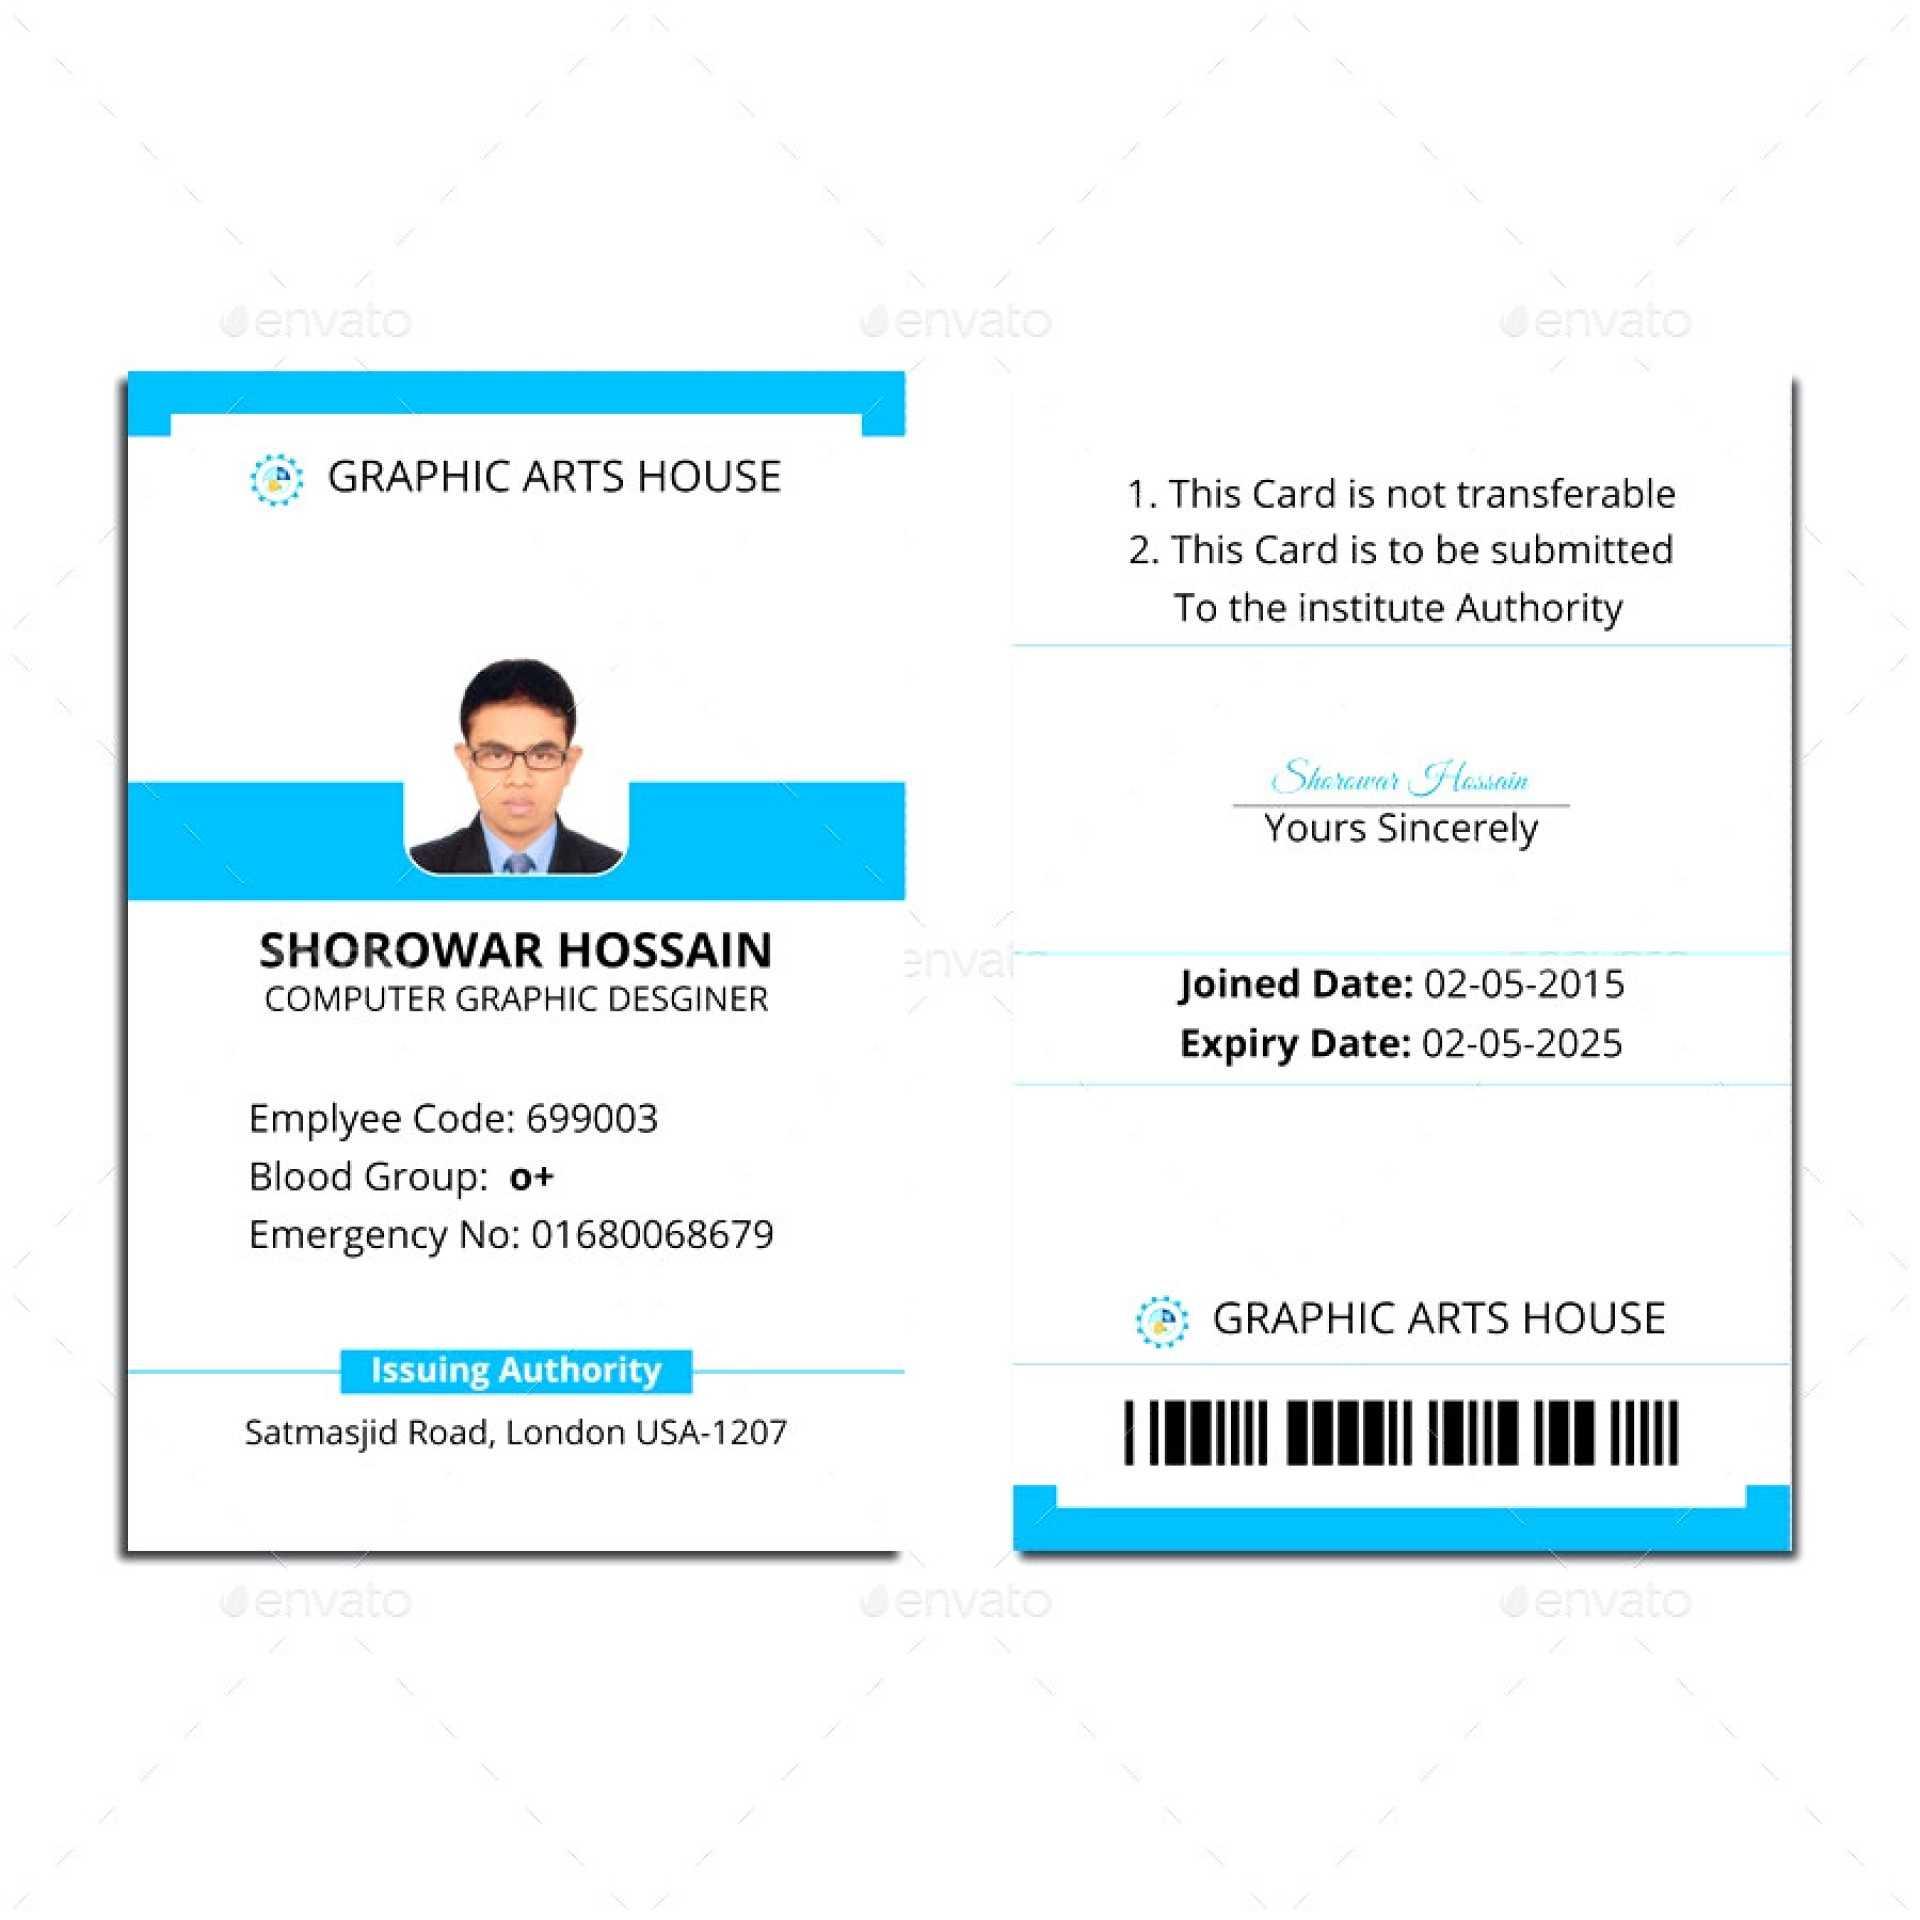 006 Id Card Template Word Ideas 1920X1920 Employee Microsoft Within Free Id Card Template Word